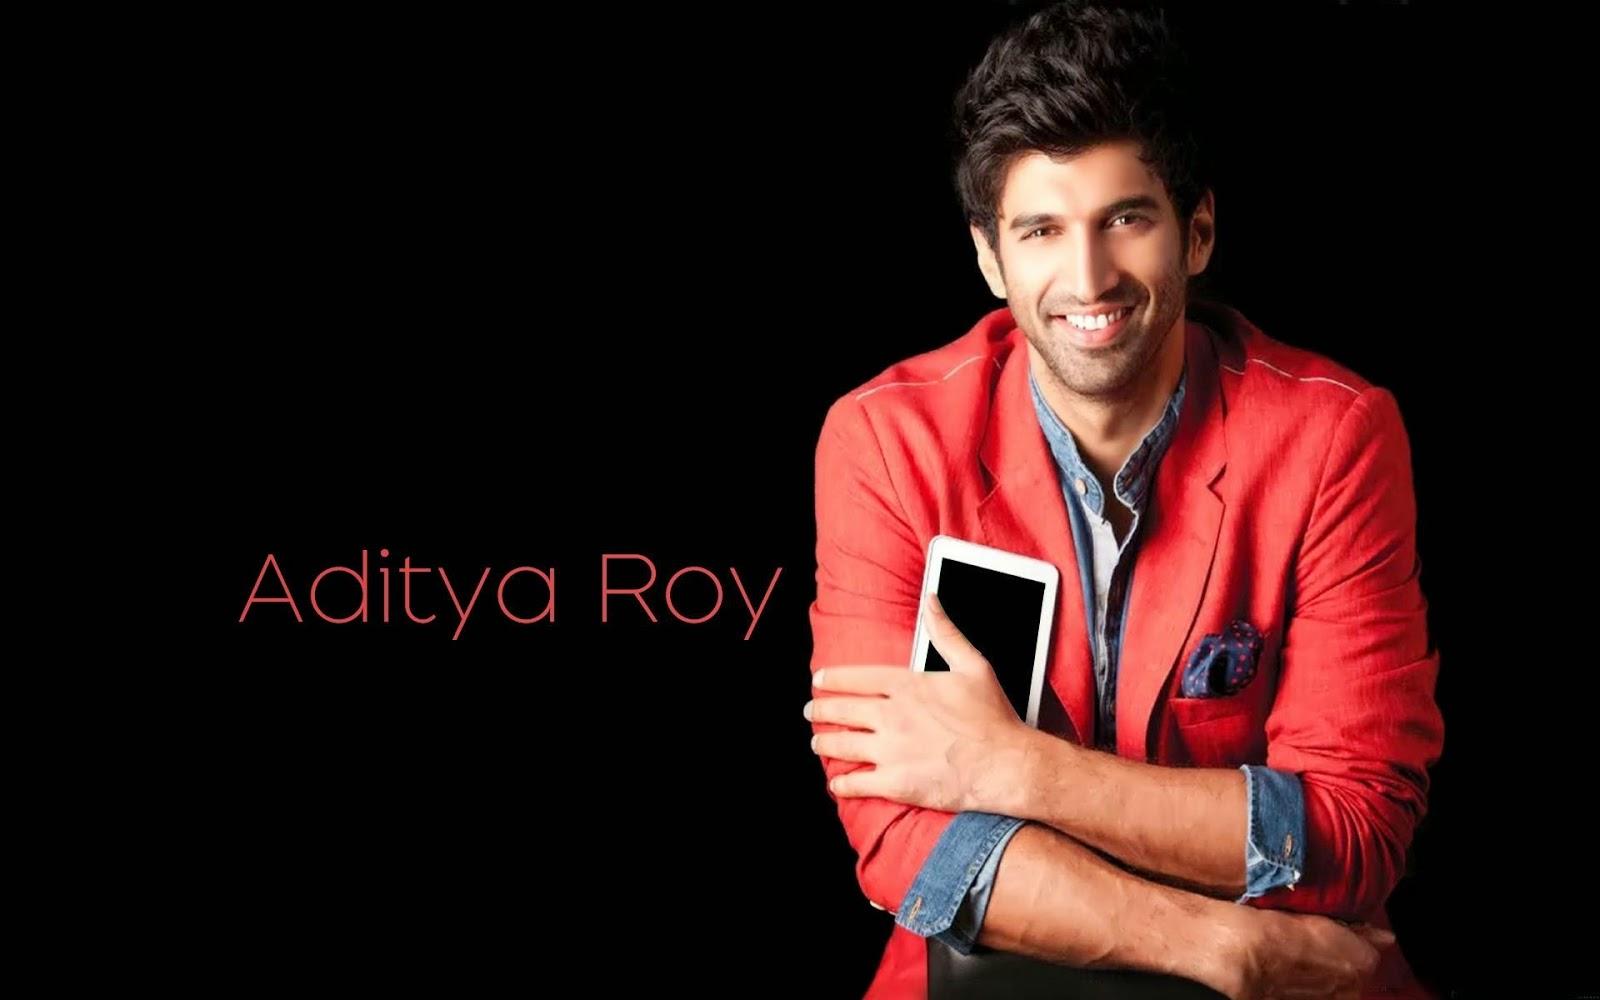 Aditya Roy Kapoor Hd Wallpaper: Wallpapers Joo: Aditya Roy Kapoor FUll HD Wallpaers